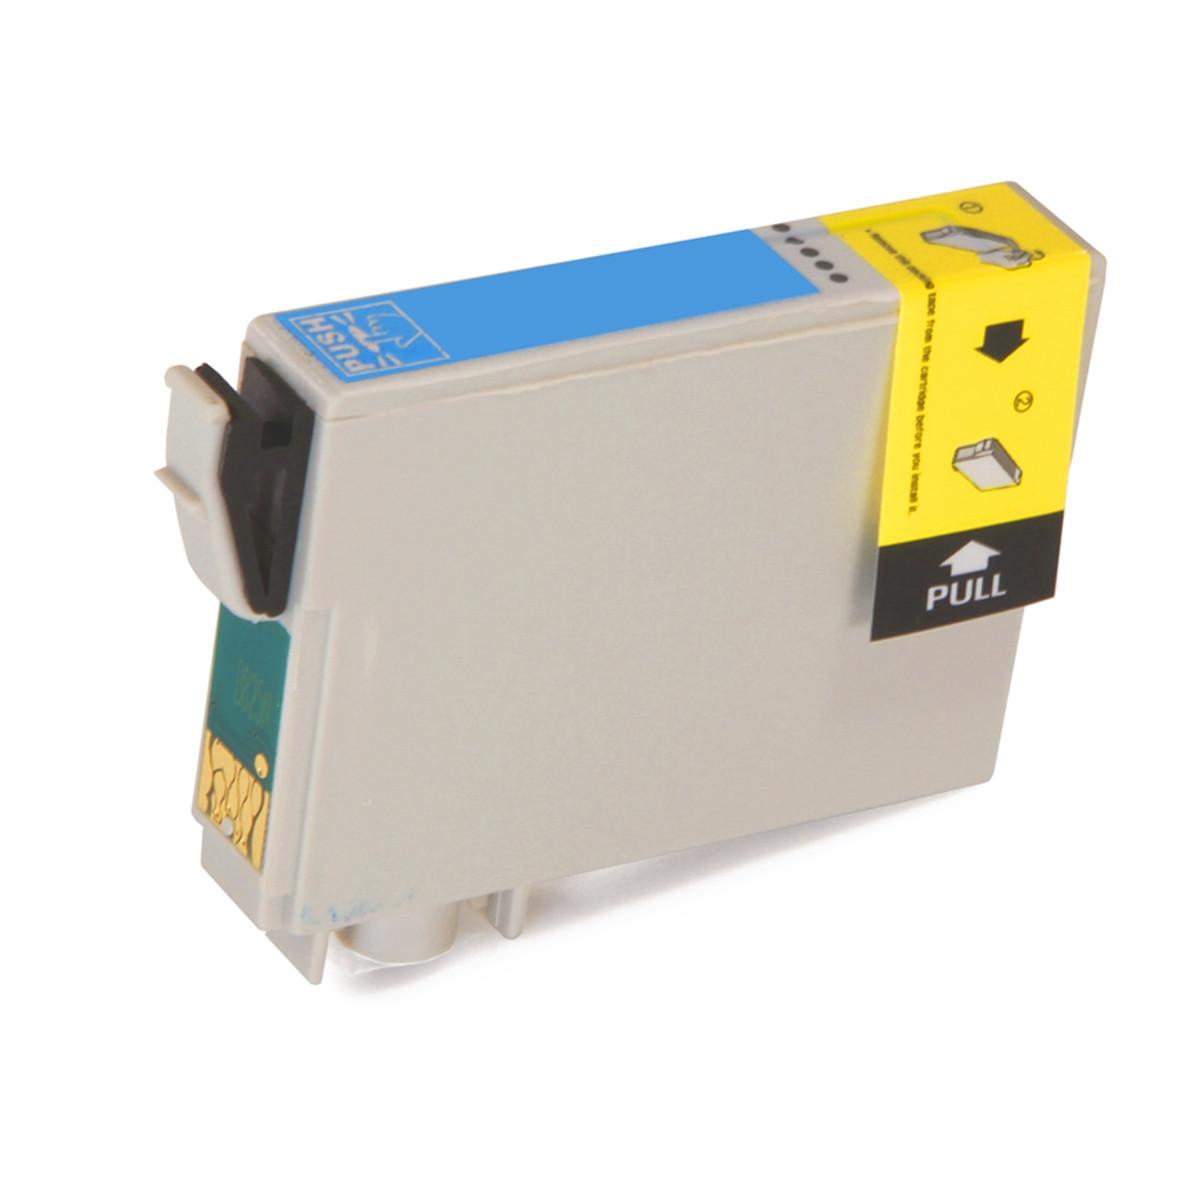 Cartucho de Tinta Compatível com Epson T078520, T0785, 78 | Ciano Claro | RX580 R260 R380 | 12 ml